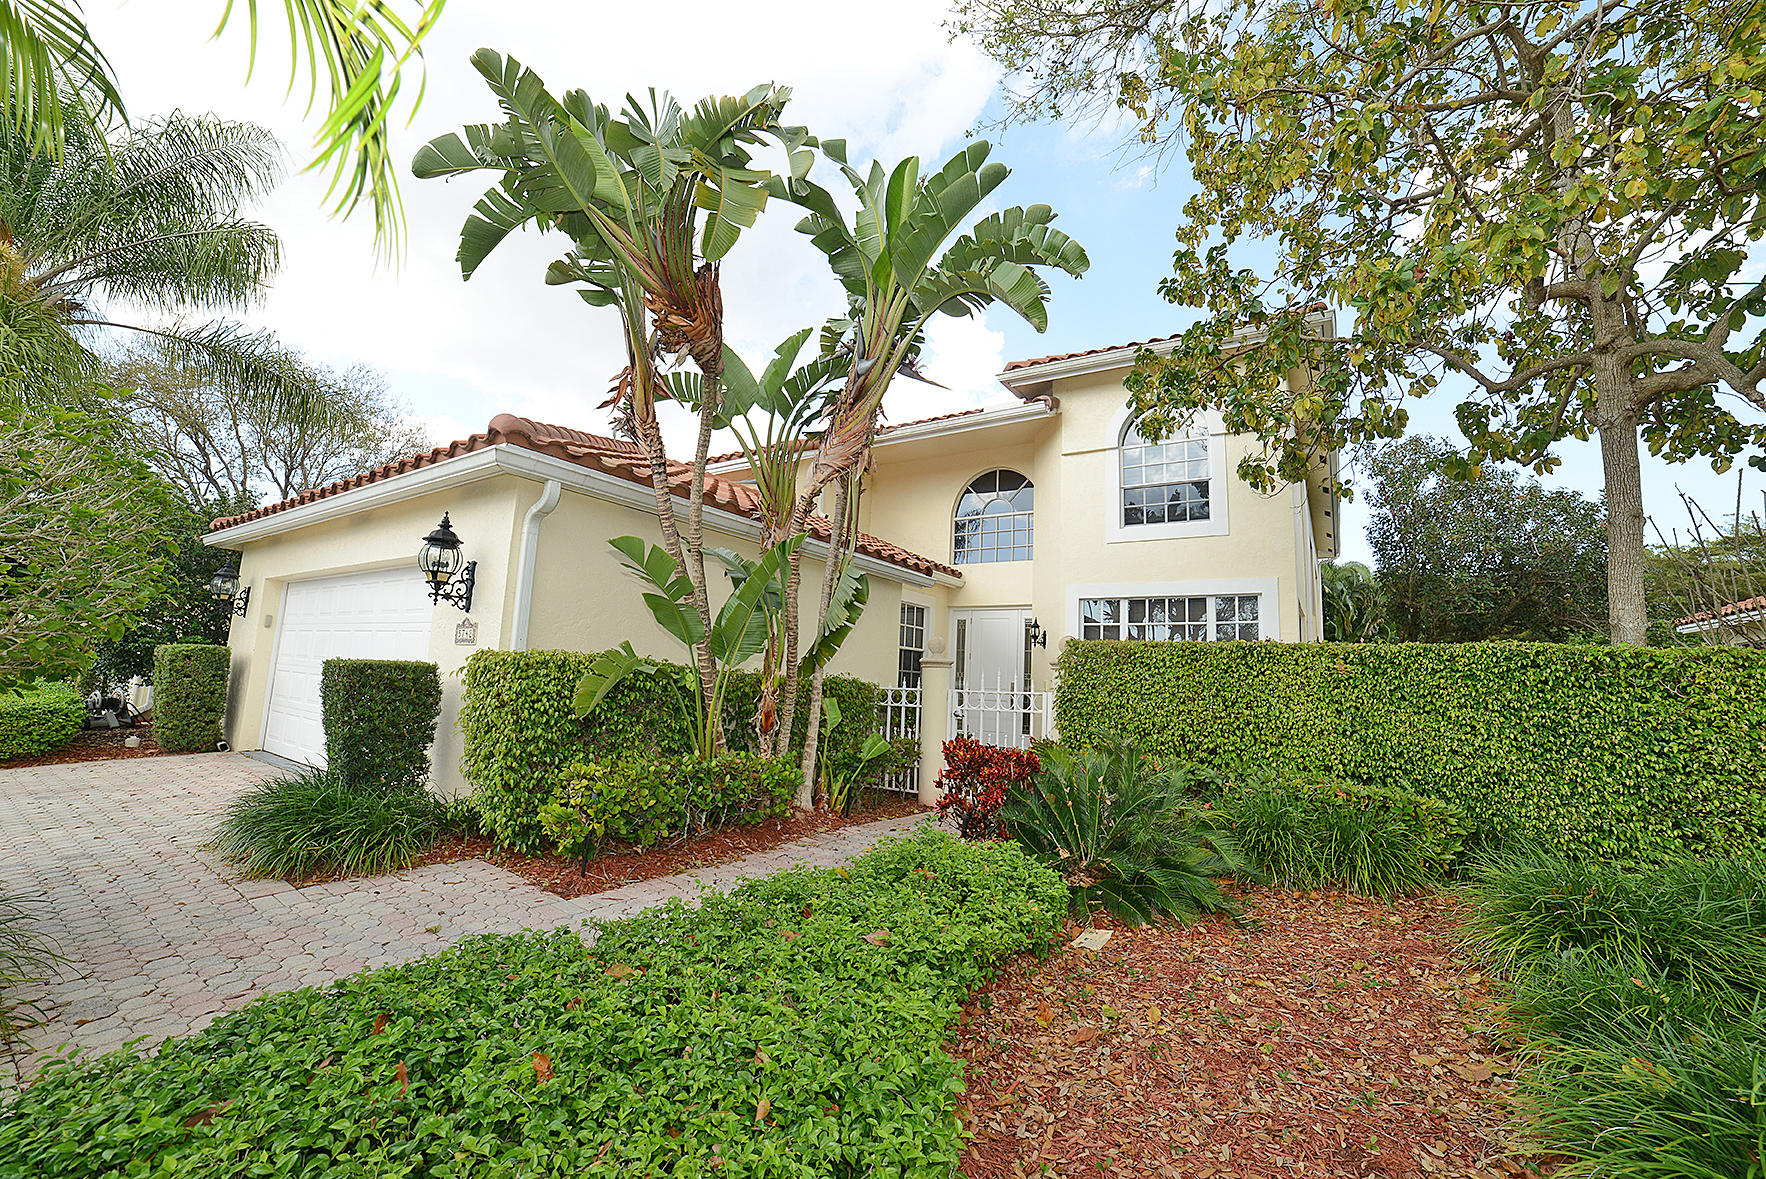 5742 Nw 24th Terrace Boca Raton, FL 33496